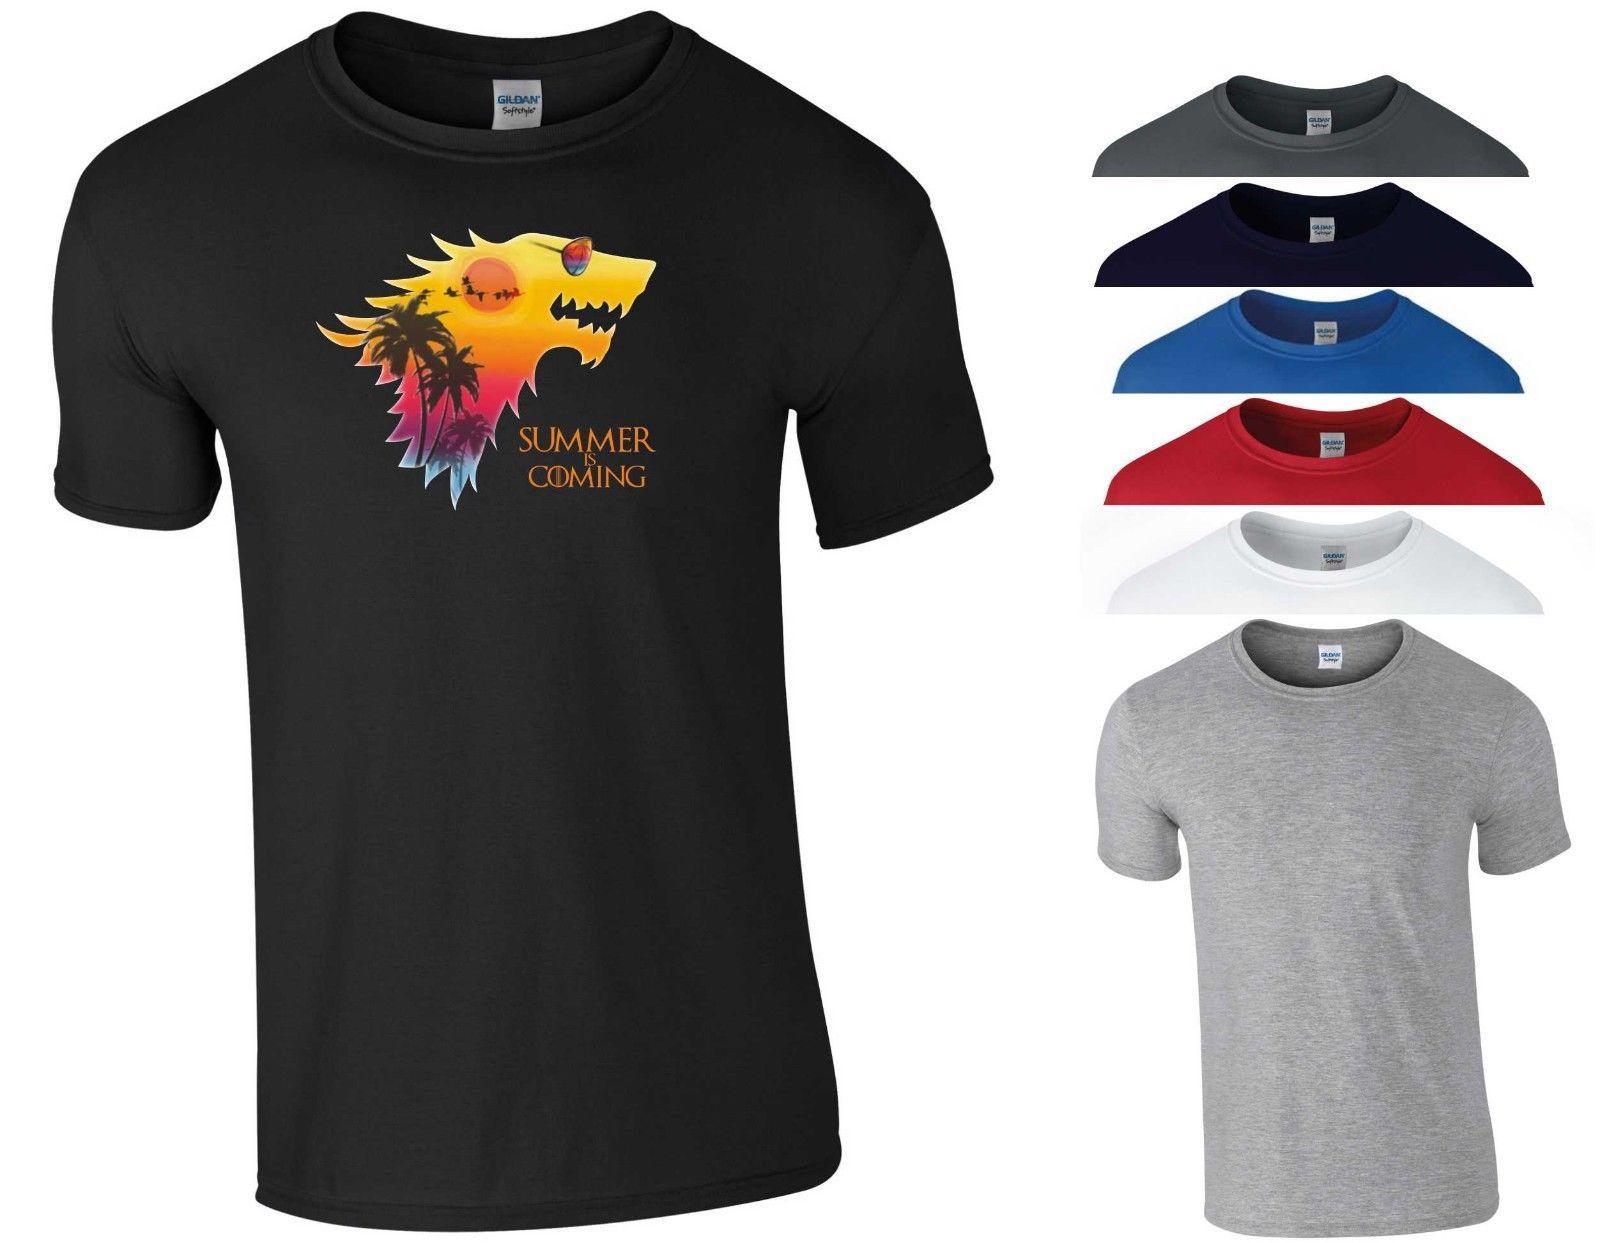 03c80796f1f5 Game Of Thrones T Shirt Summer Is Coming Parody GOT Wolf Jon Snow Gift Men  Top Funny Tshirt Top T Shirt Online T Shirt Designer From Mvptshirt